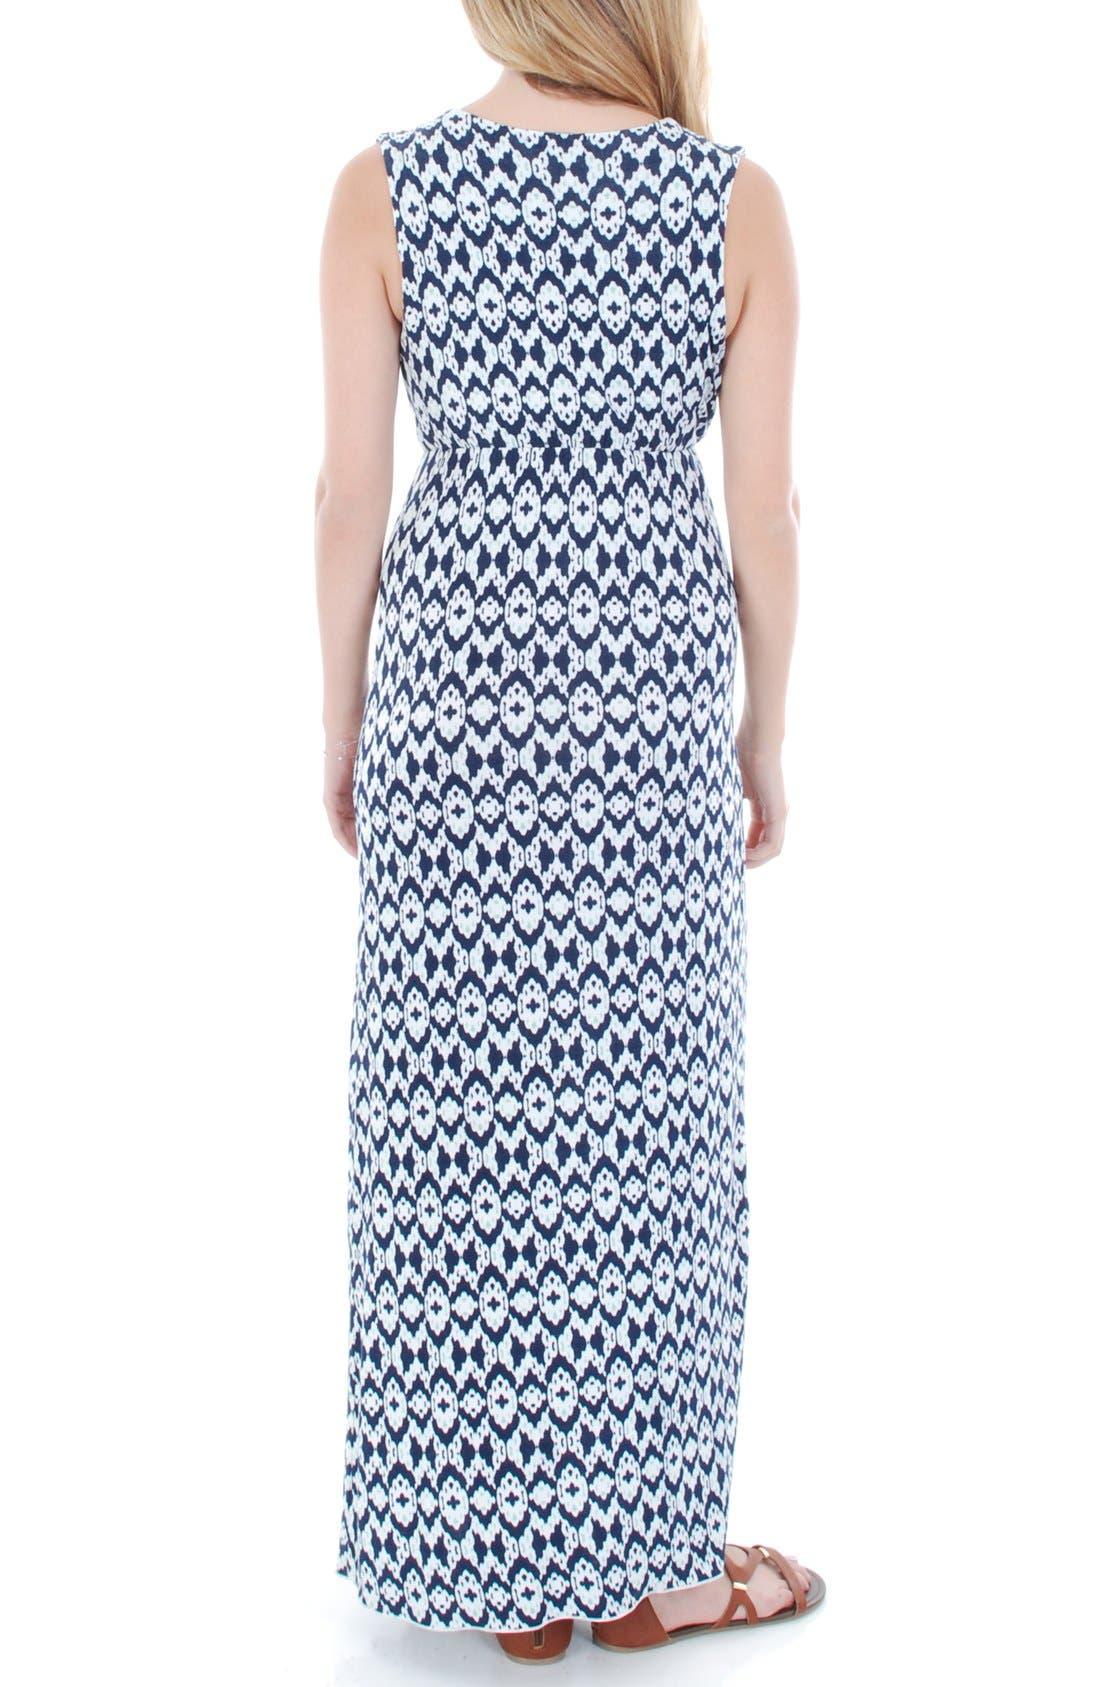 'Jill' Maternity Maxi Dress,                             Alternate thumbnail 2, color,                             400